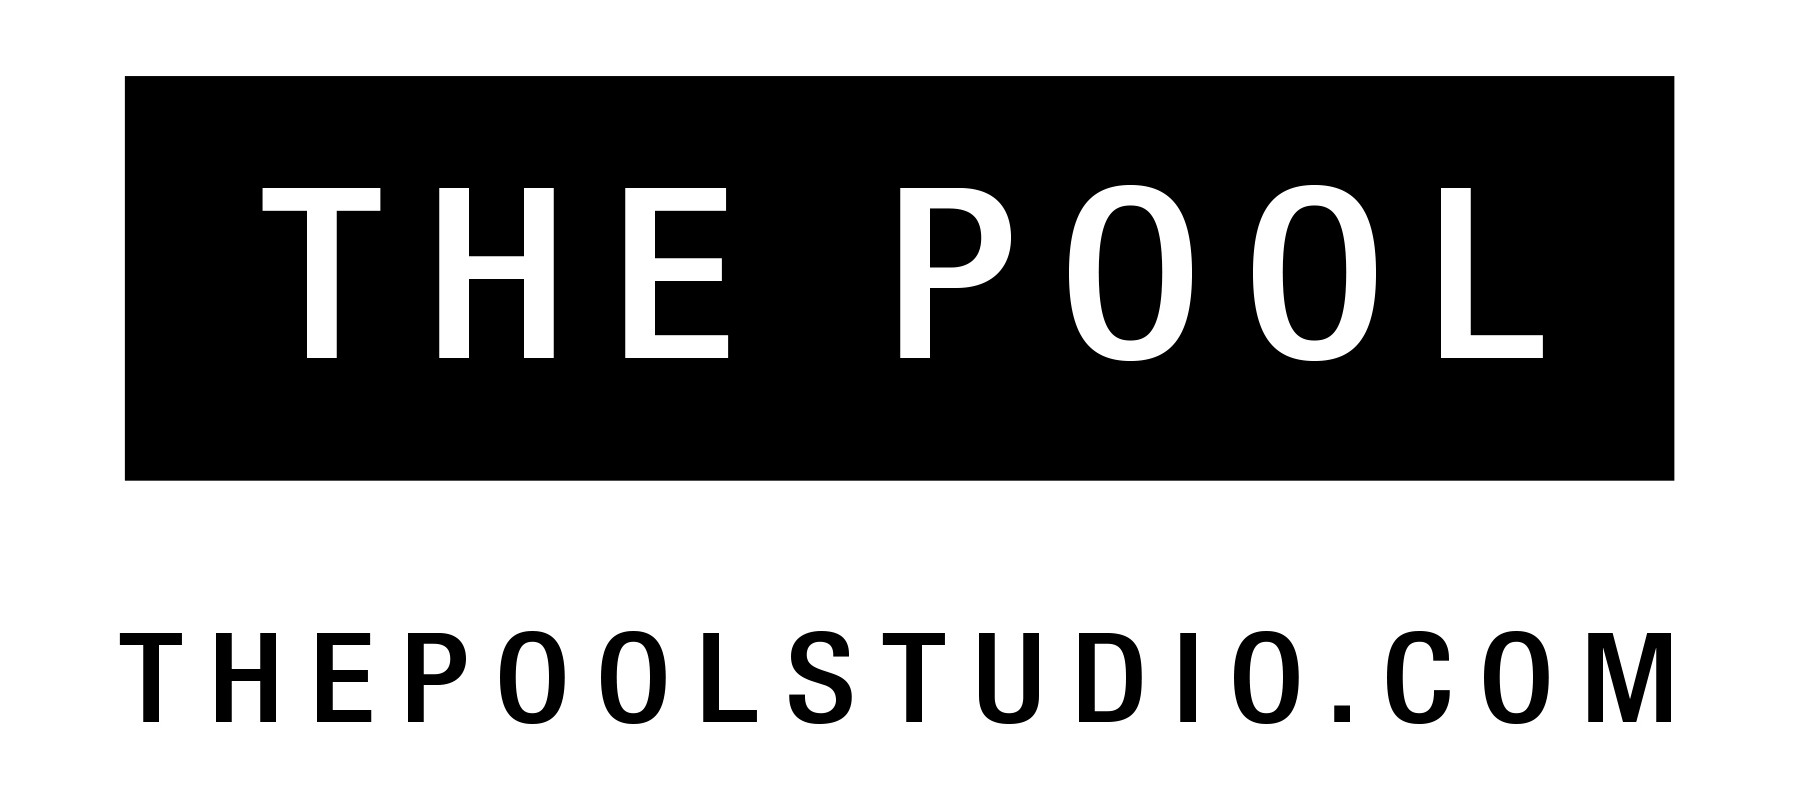 The Pool Studio Web